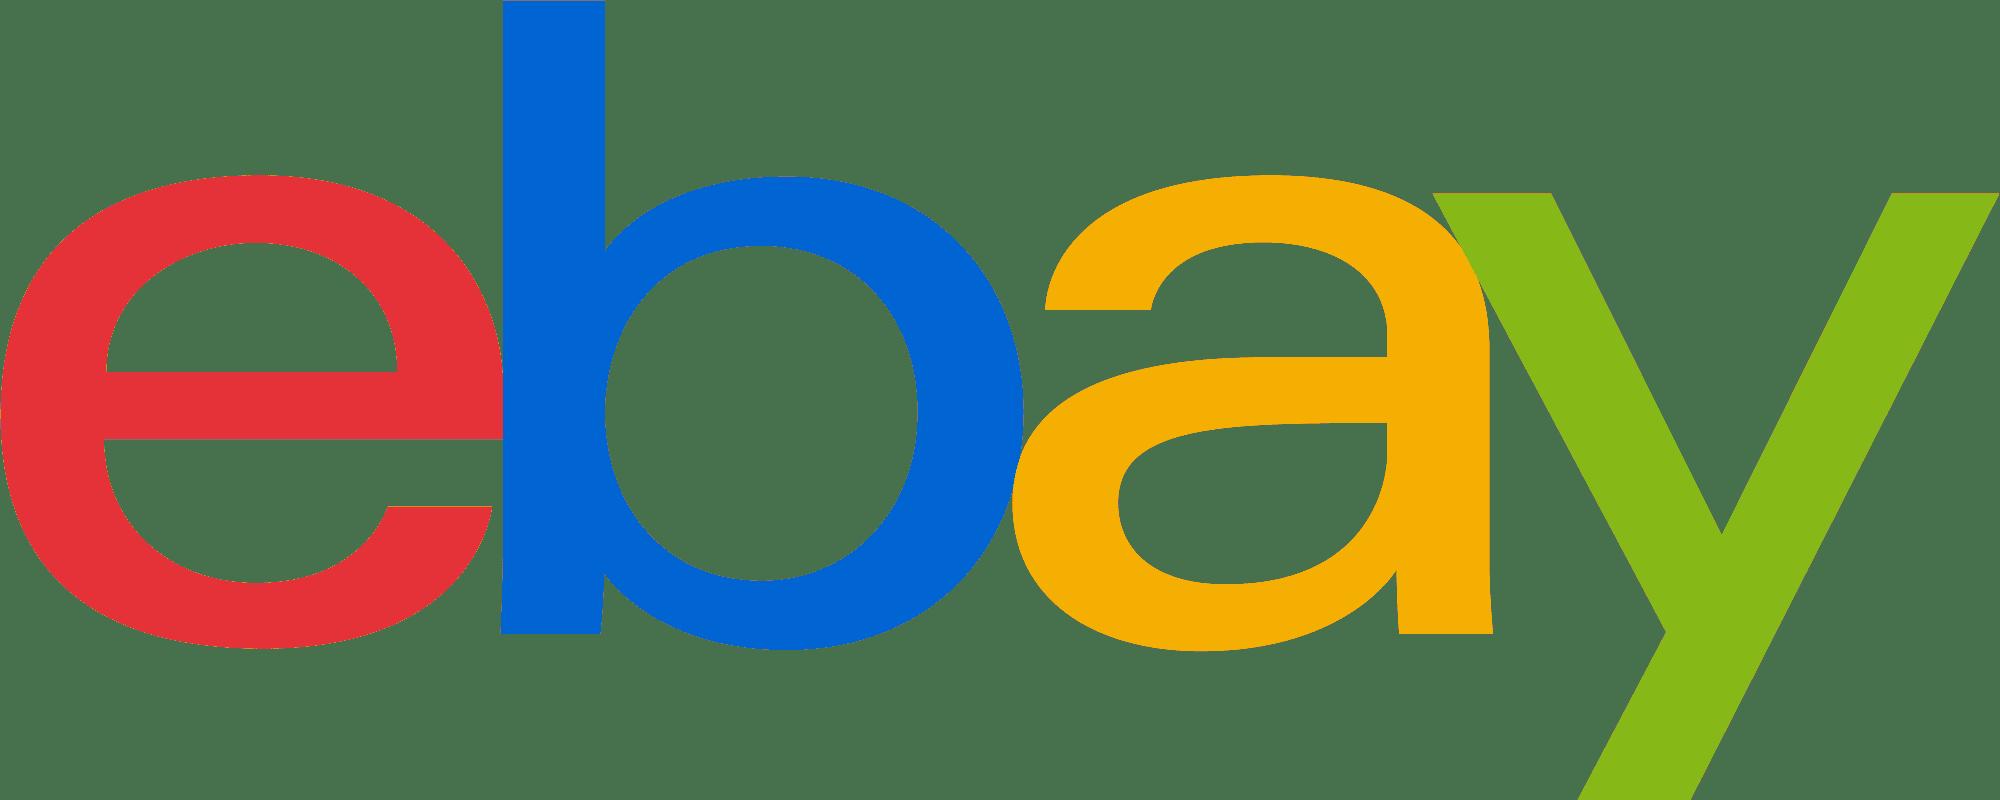 Certified Refurbished Tech Deals at eBay